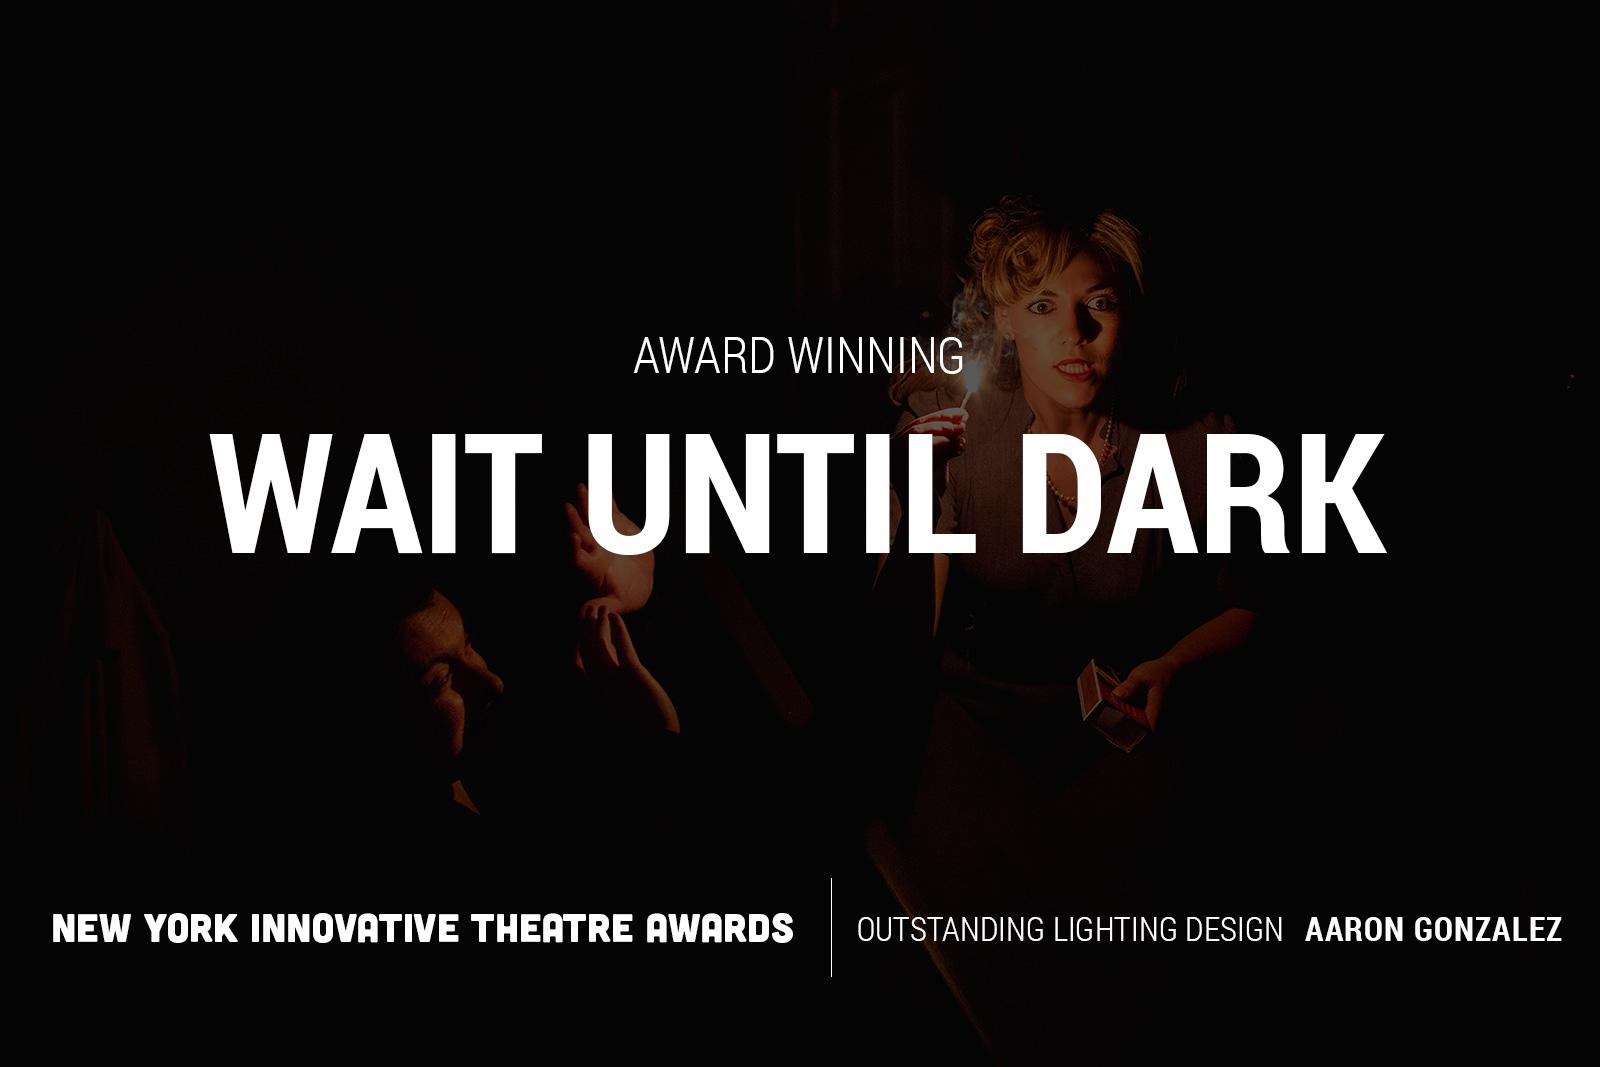 waituntildark-award.jpg